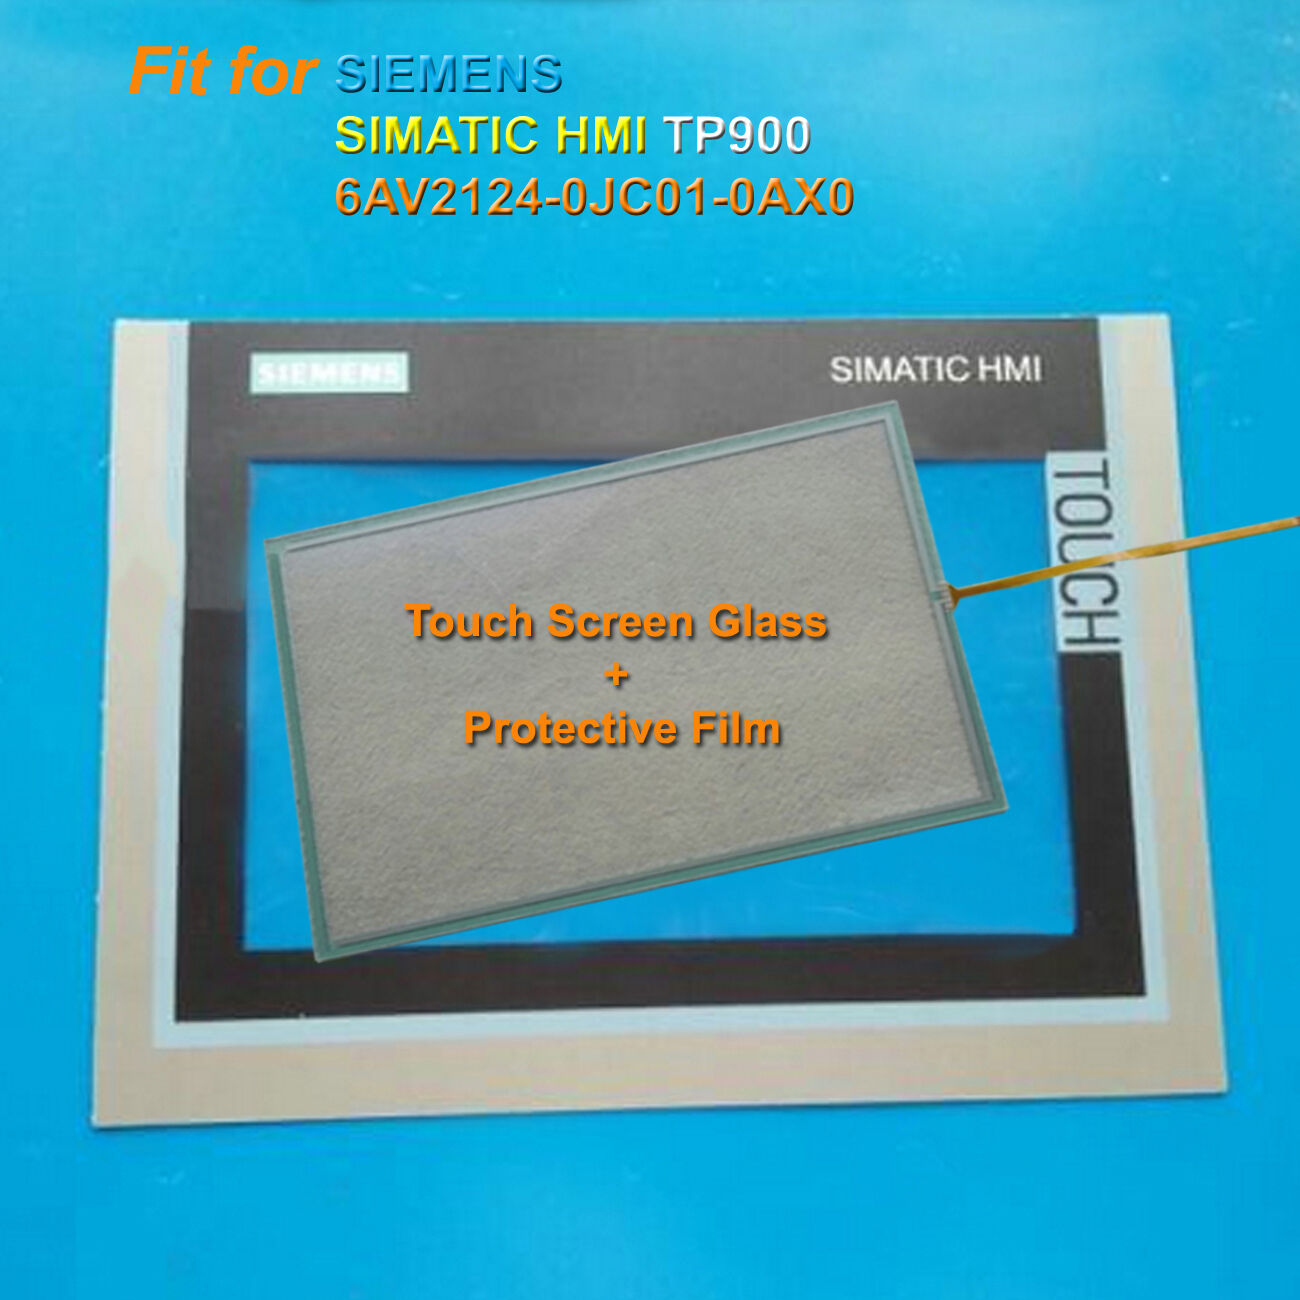 mask for Siemens SIMATIC HMI 6AV2124-0GC01-0AX0 TP700 New protective film